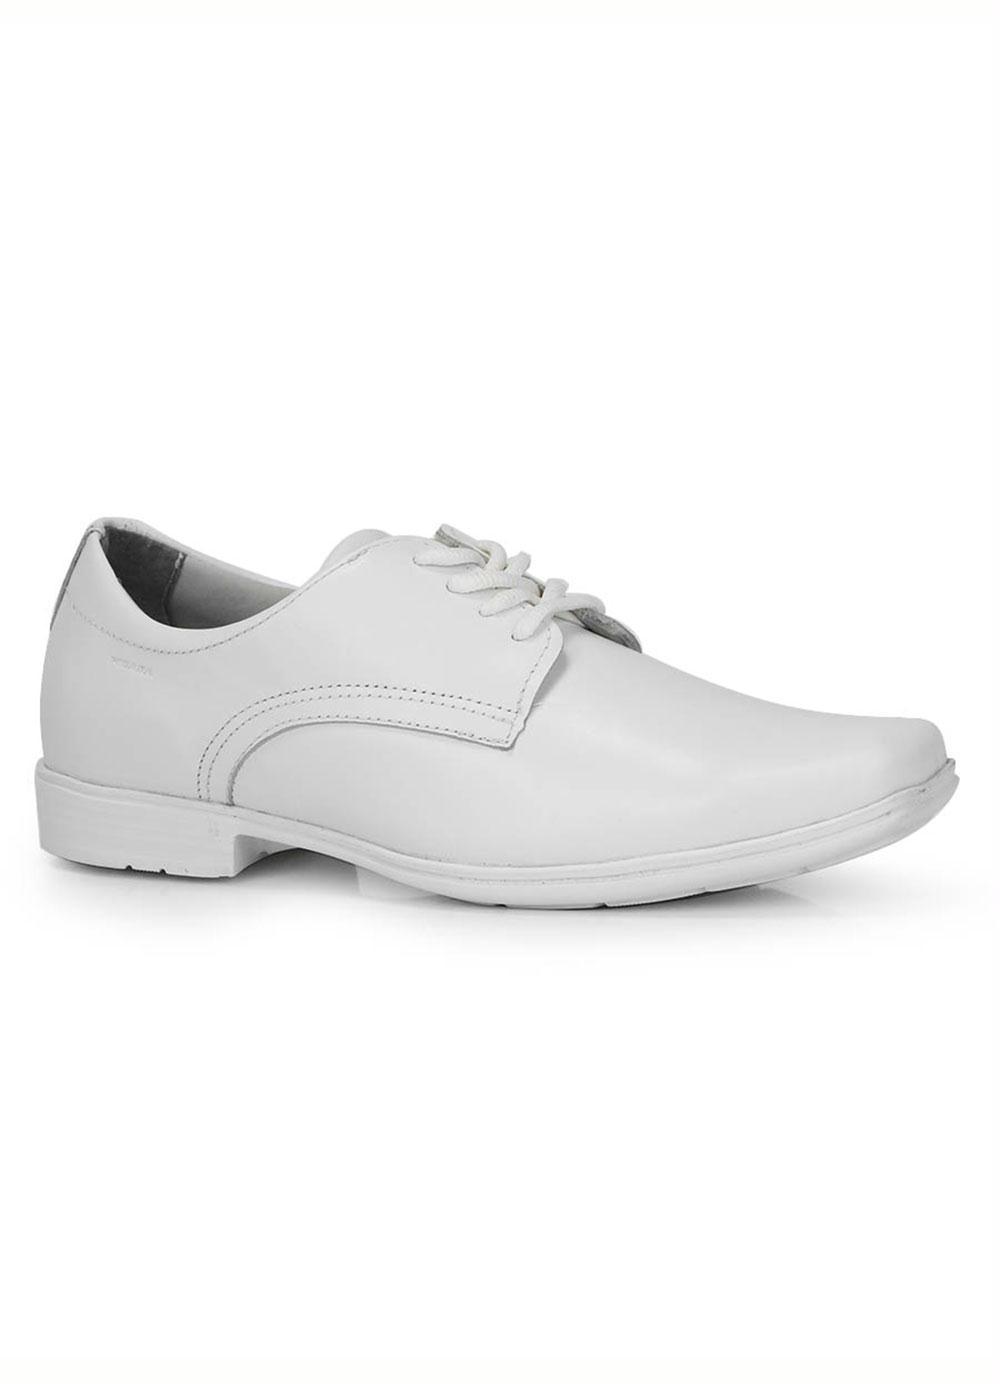 b35c5eed7c842 Sapato Masculino Pegada Branco - Passarela